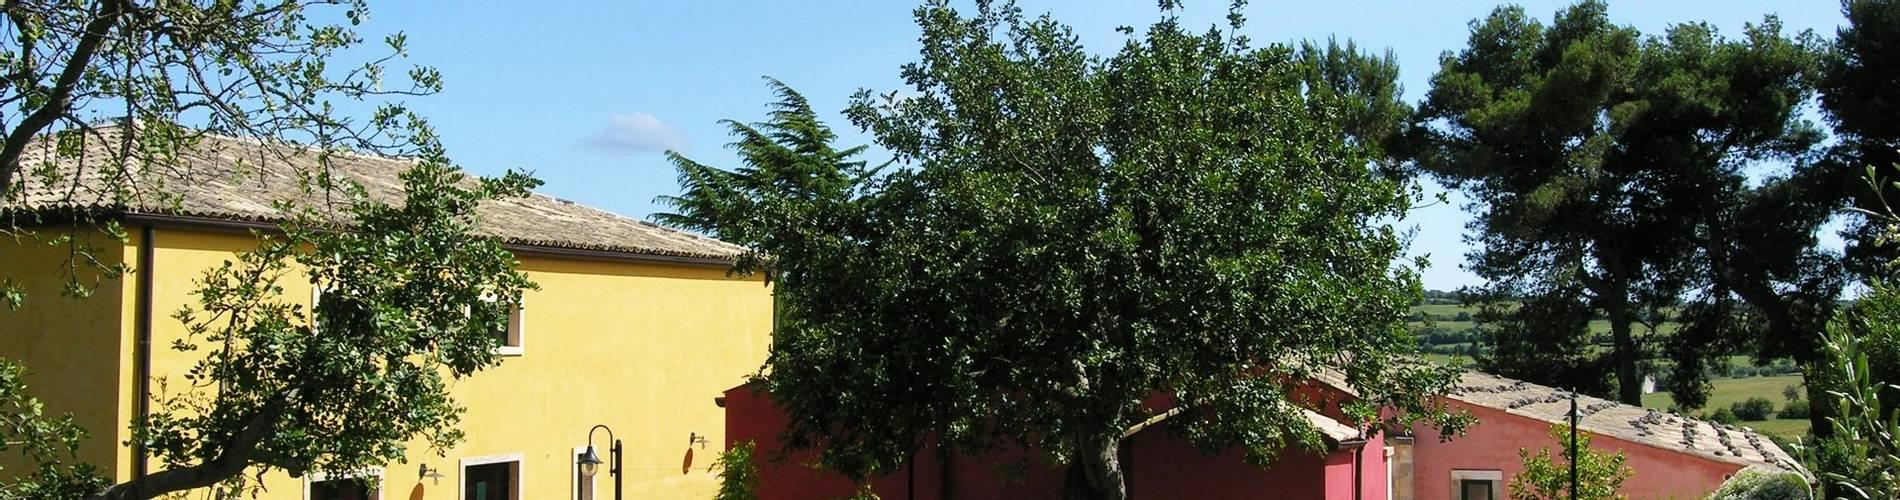 Il Paesino, Sicily, Italy (10).jpg